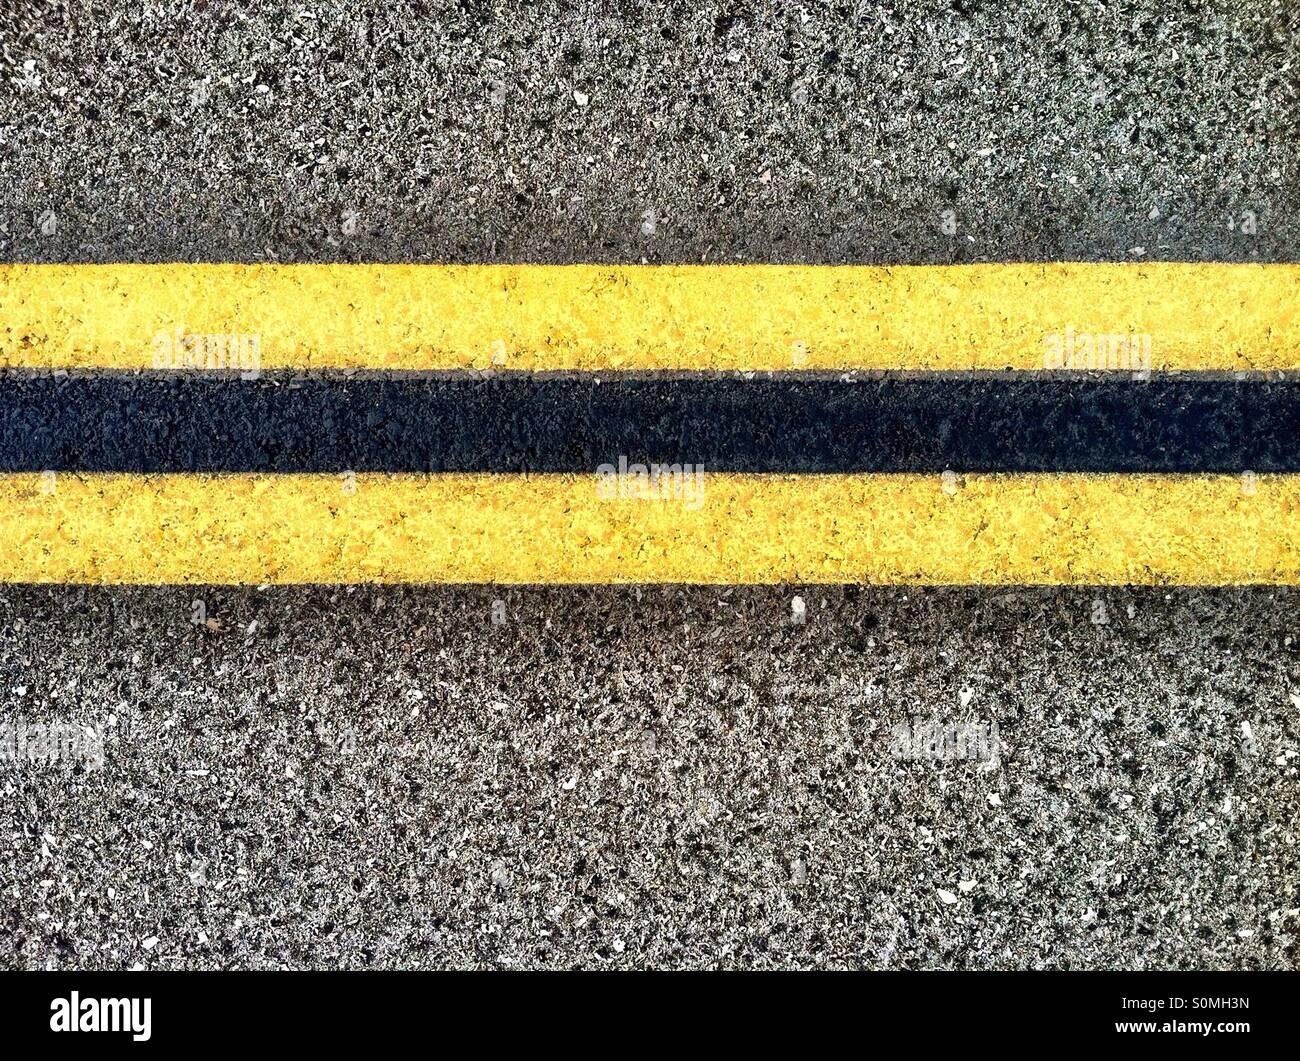 Double yellow lines on Highway - Stock Image